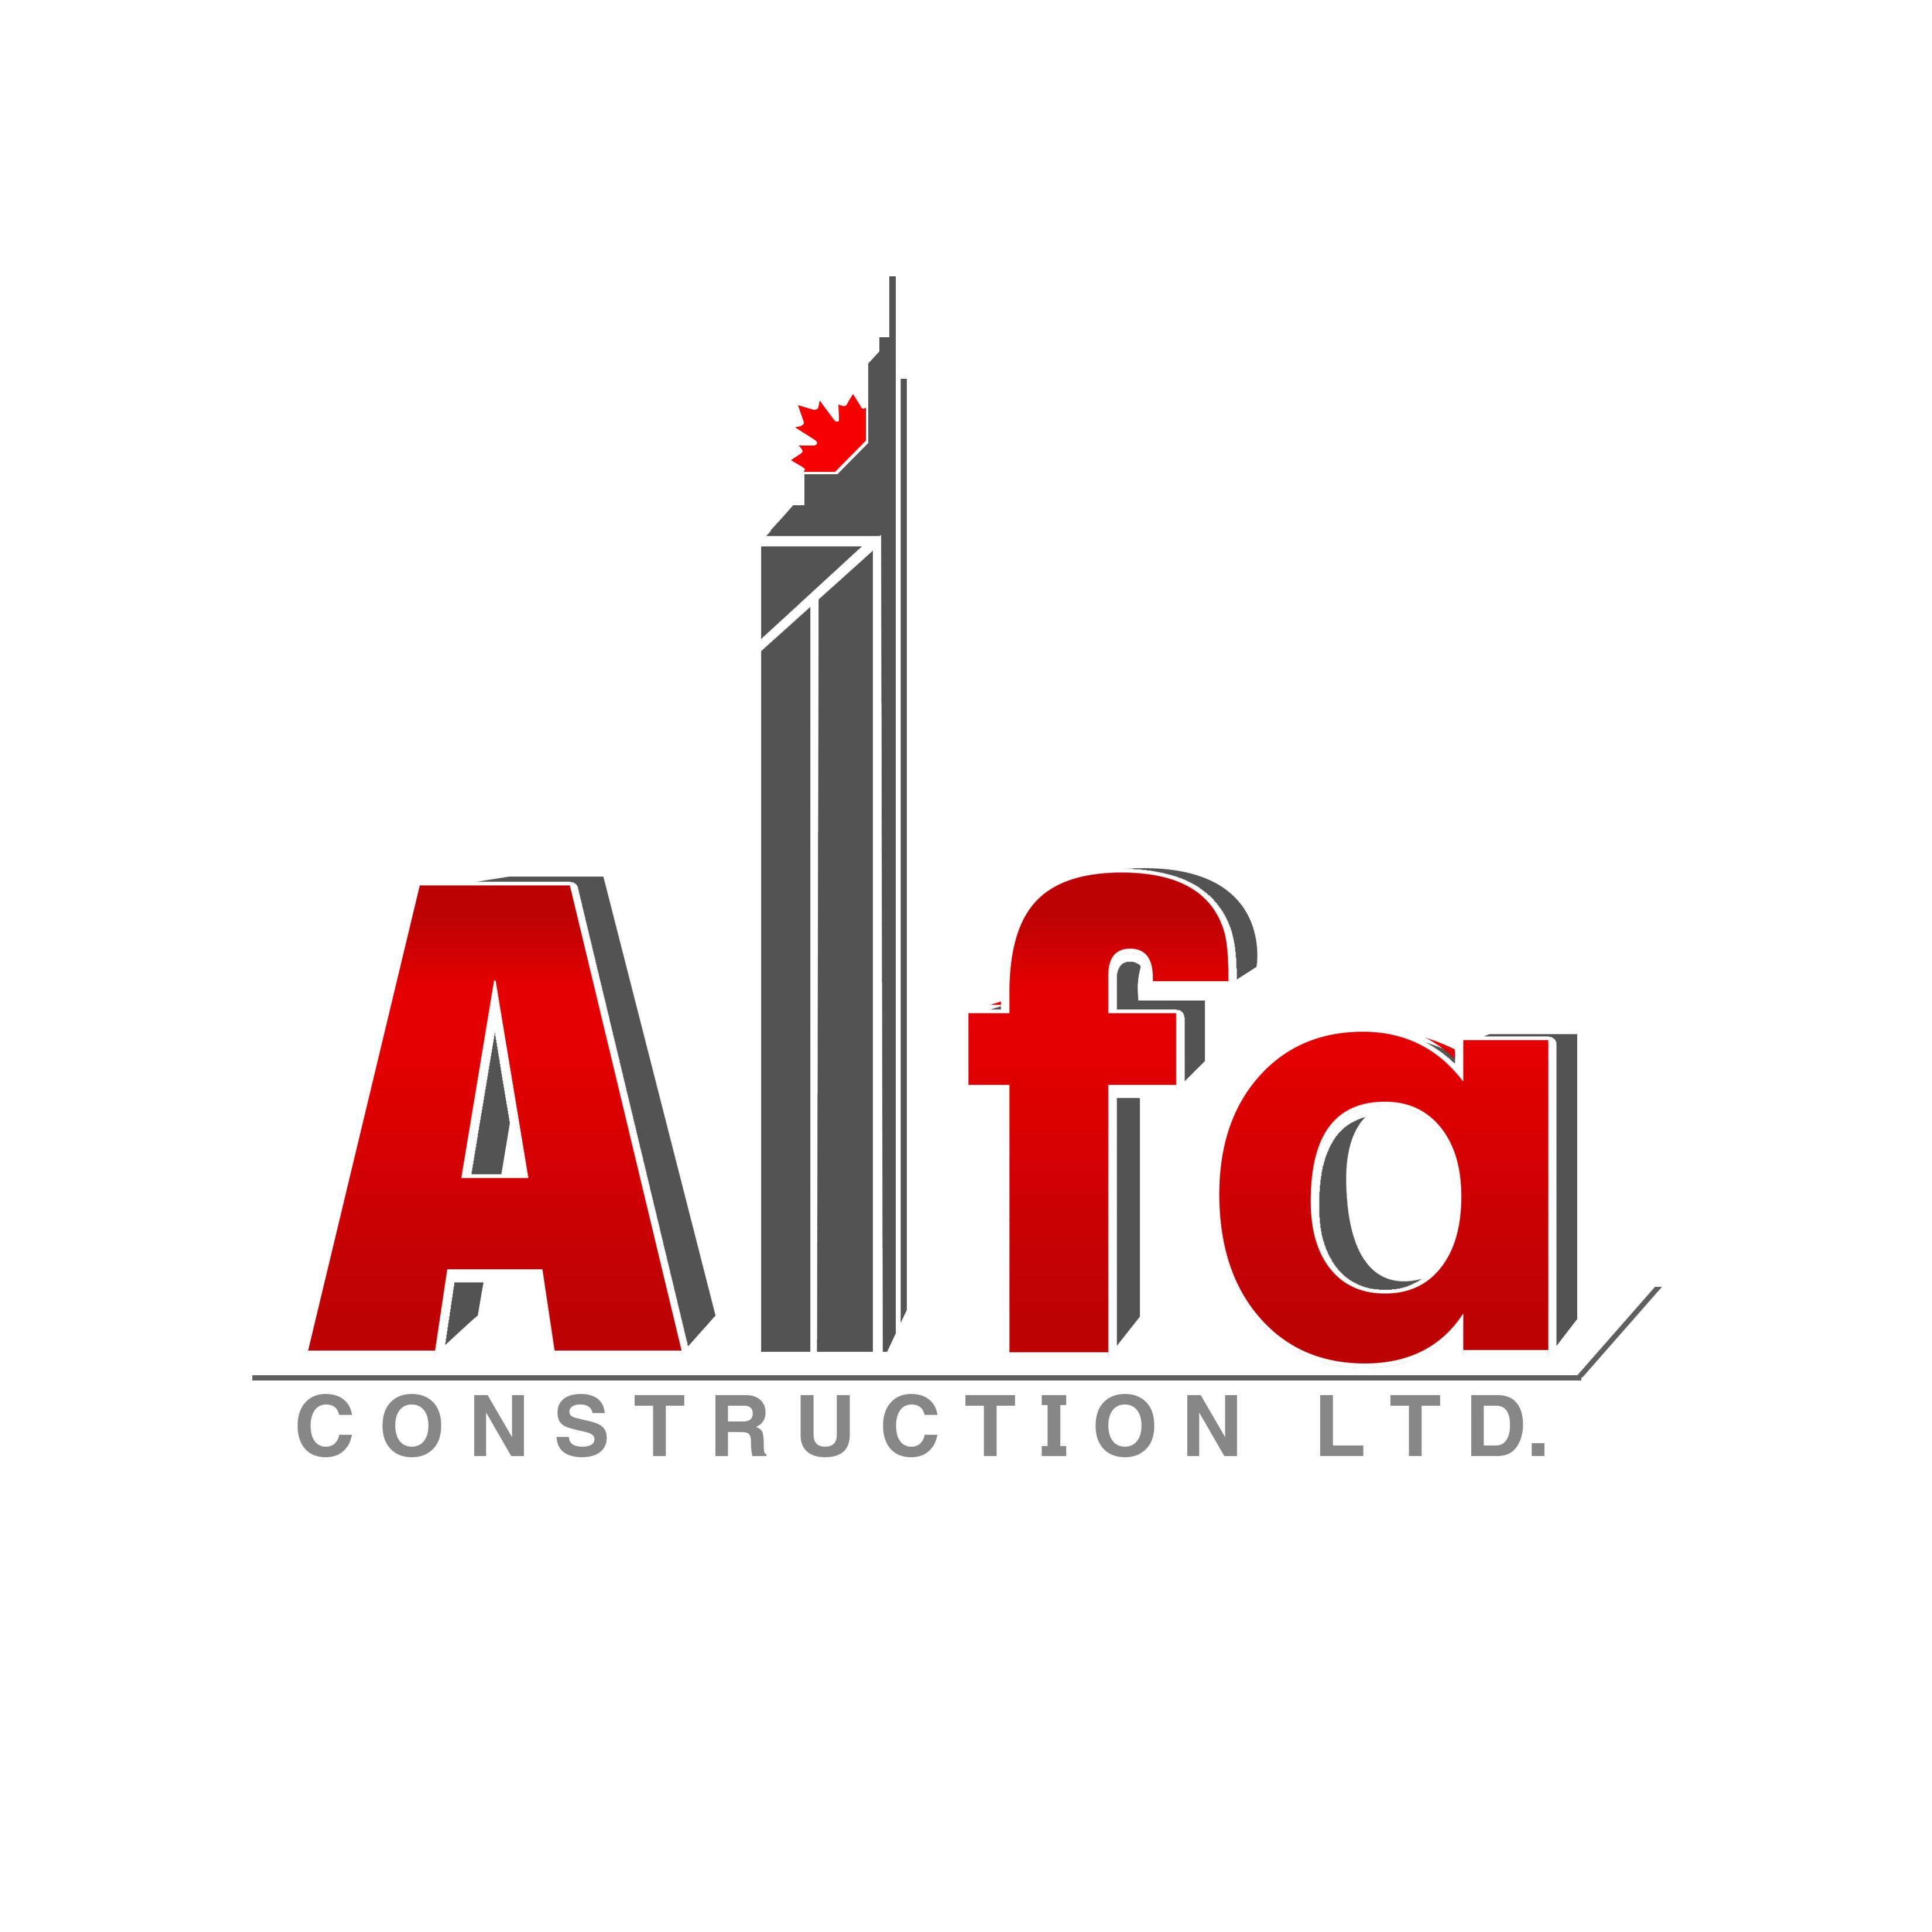 Logo Design by Allan Esclamado - Entry No. 49 in the Logo Design Contest Fun Logo Design for Alfa Construction Ltd.